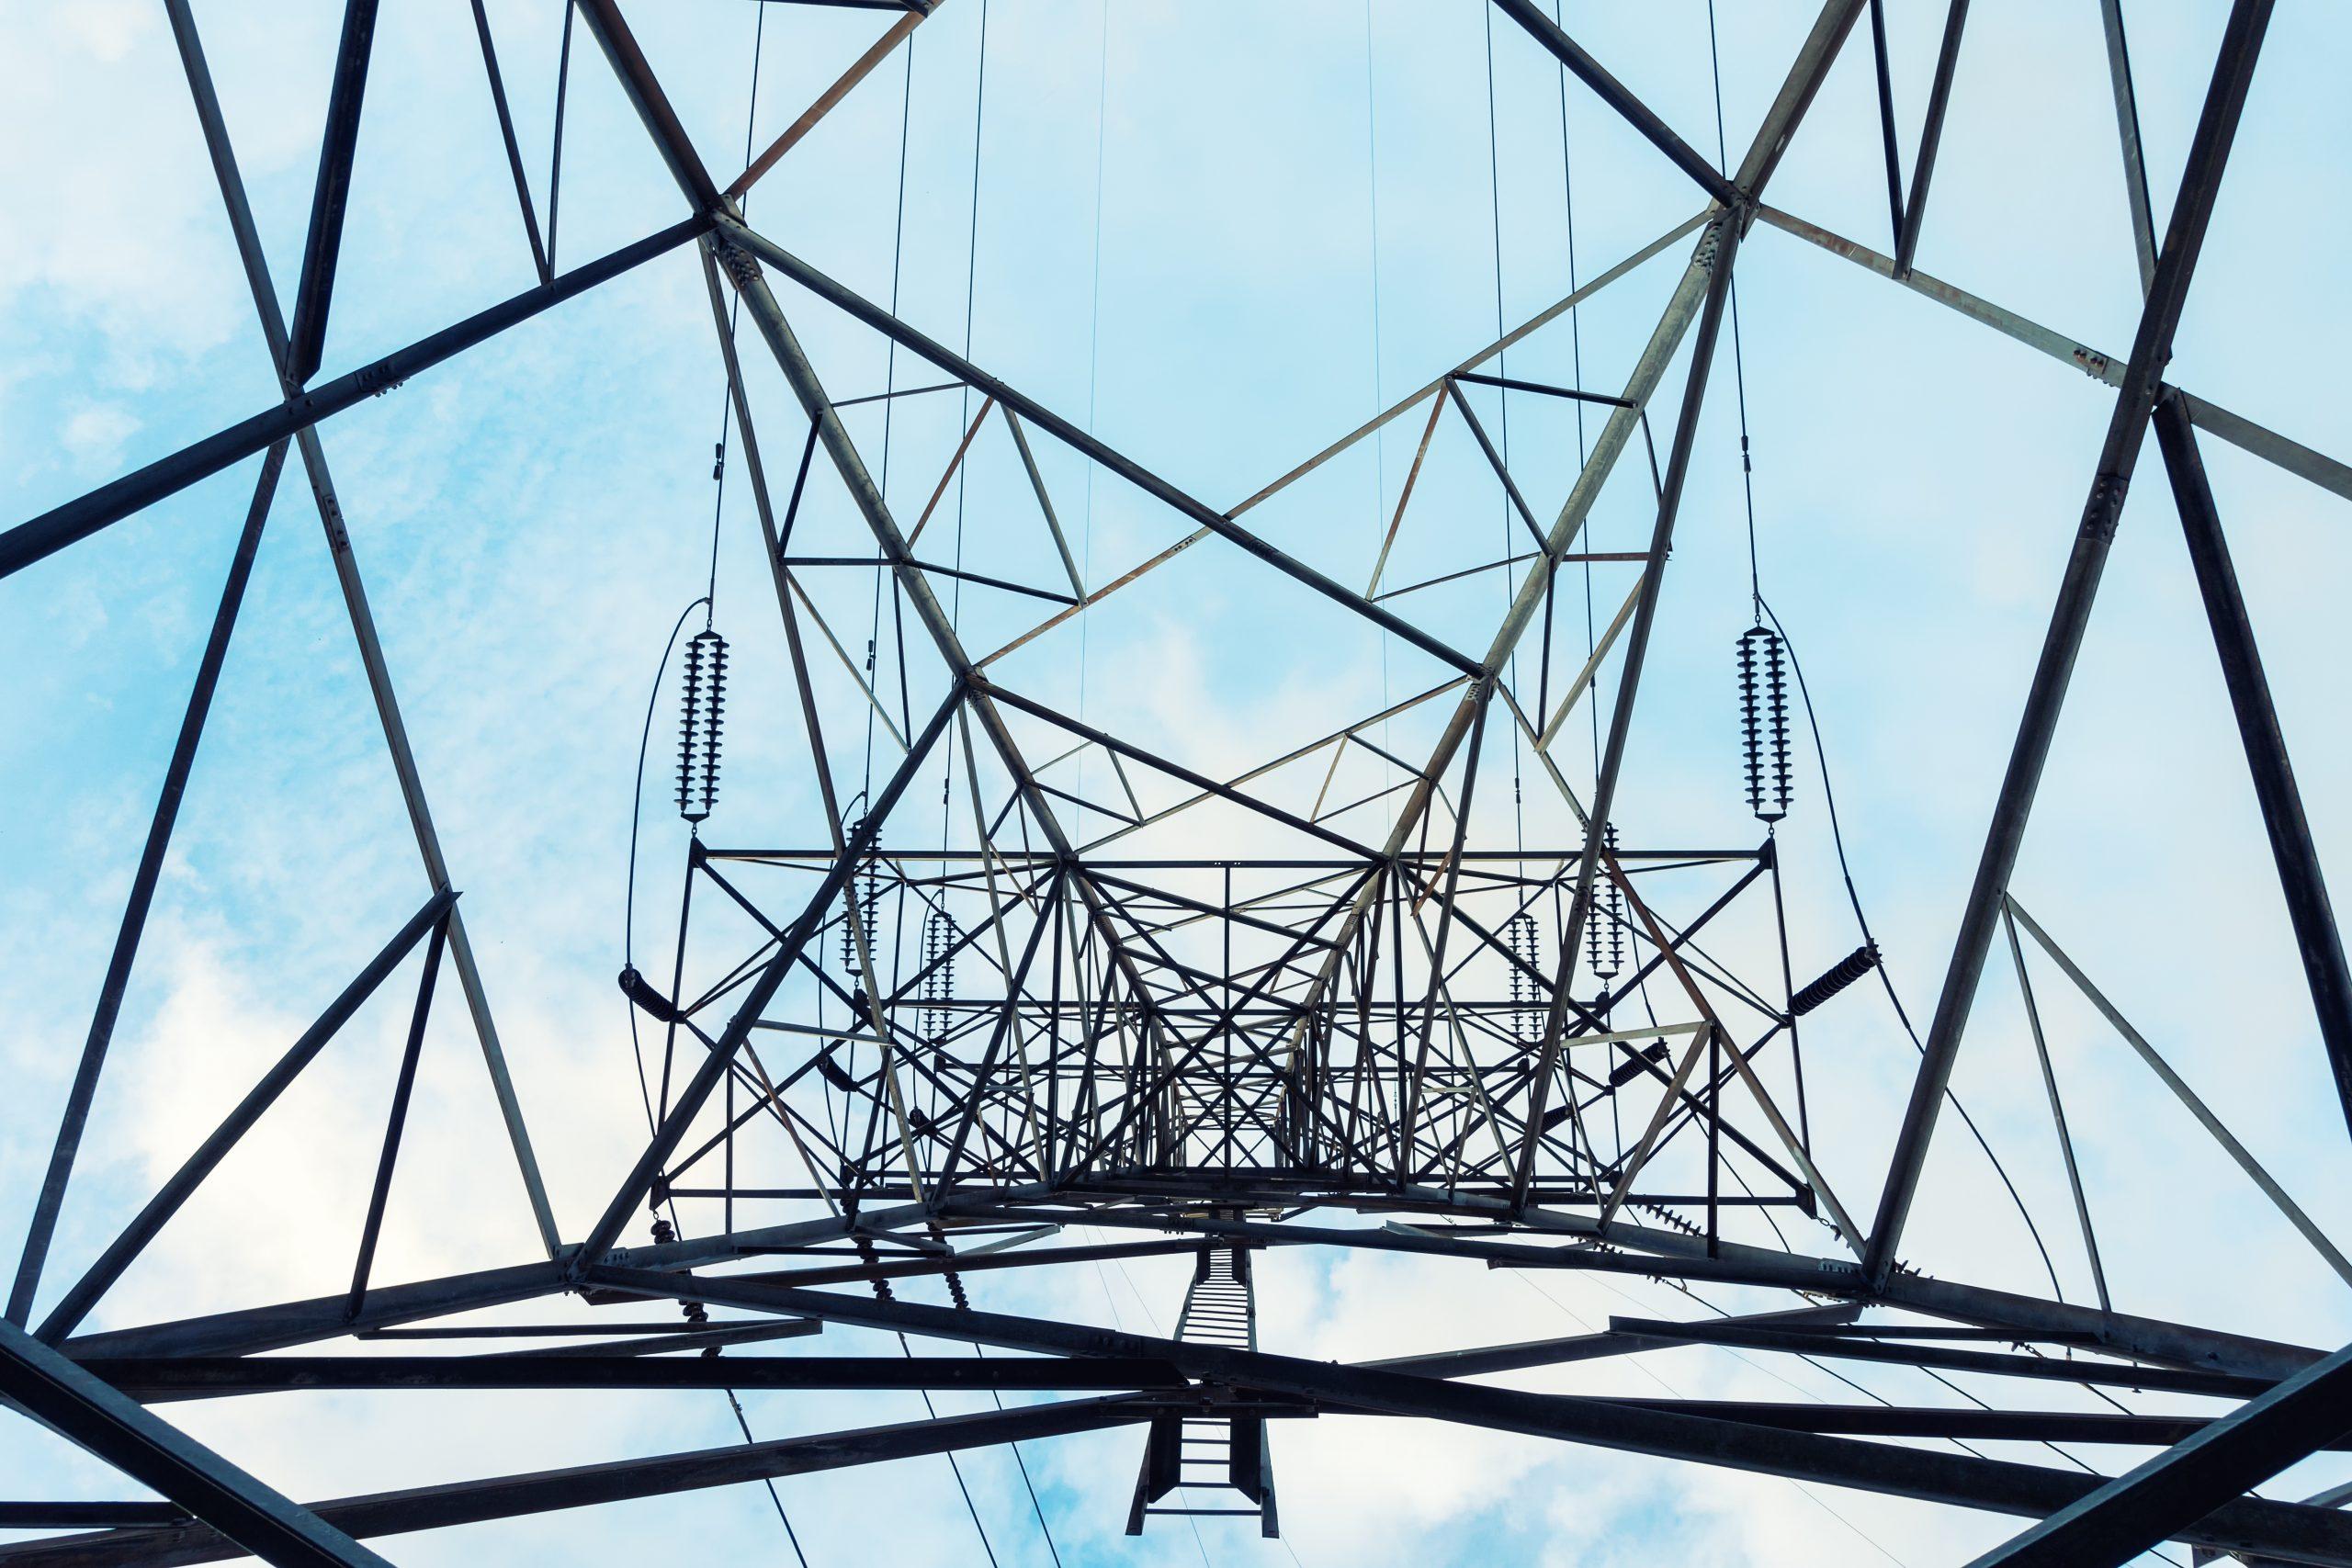 Flex assets to reduce renewable portfolio risk